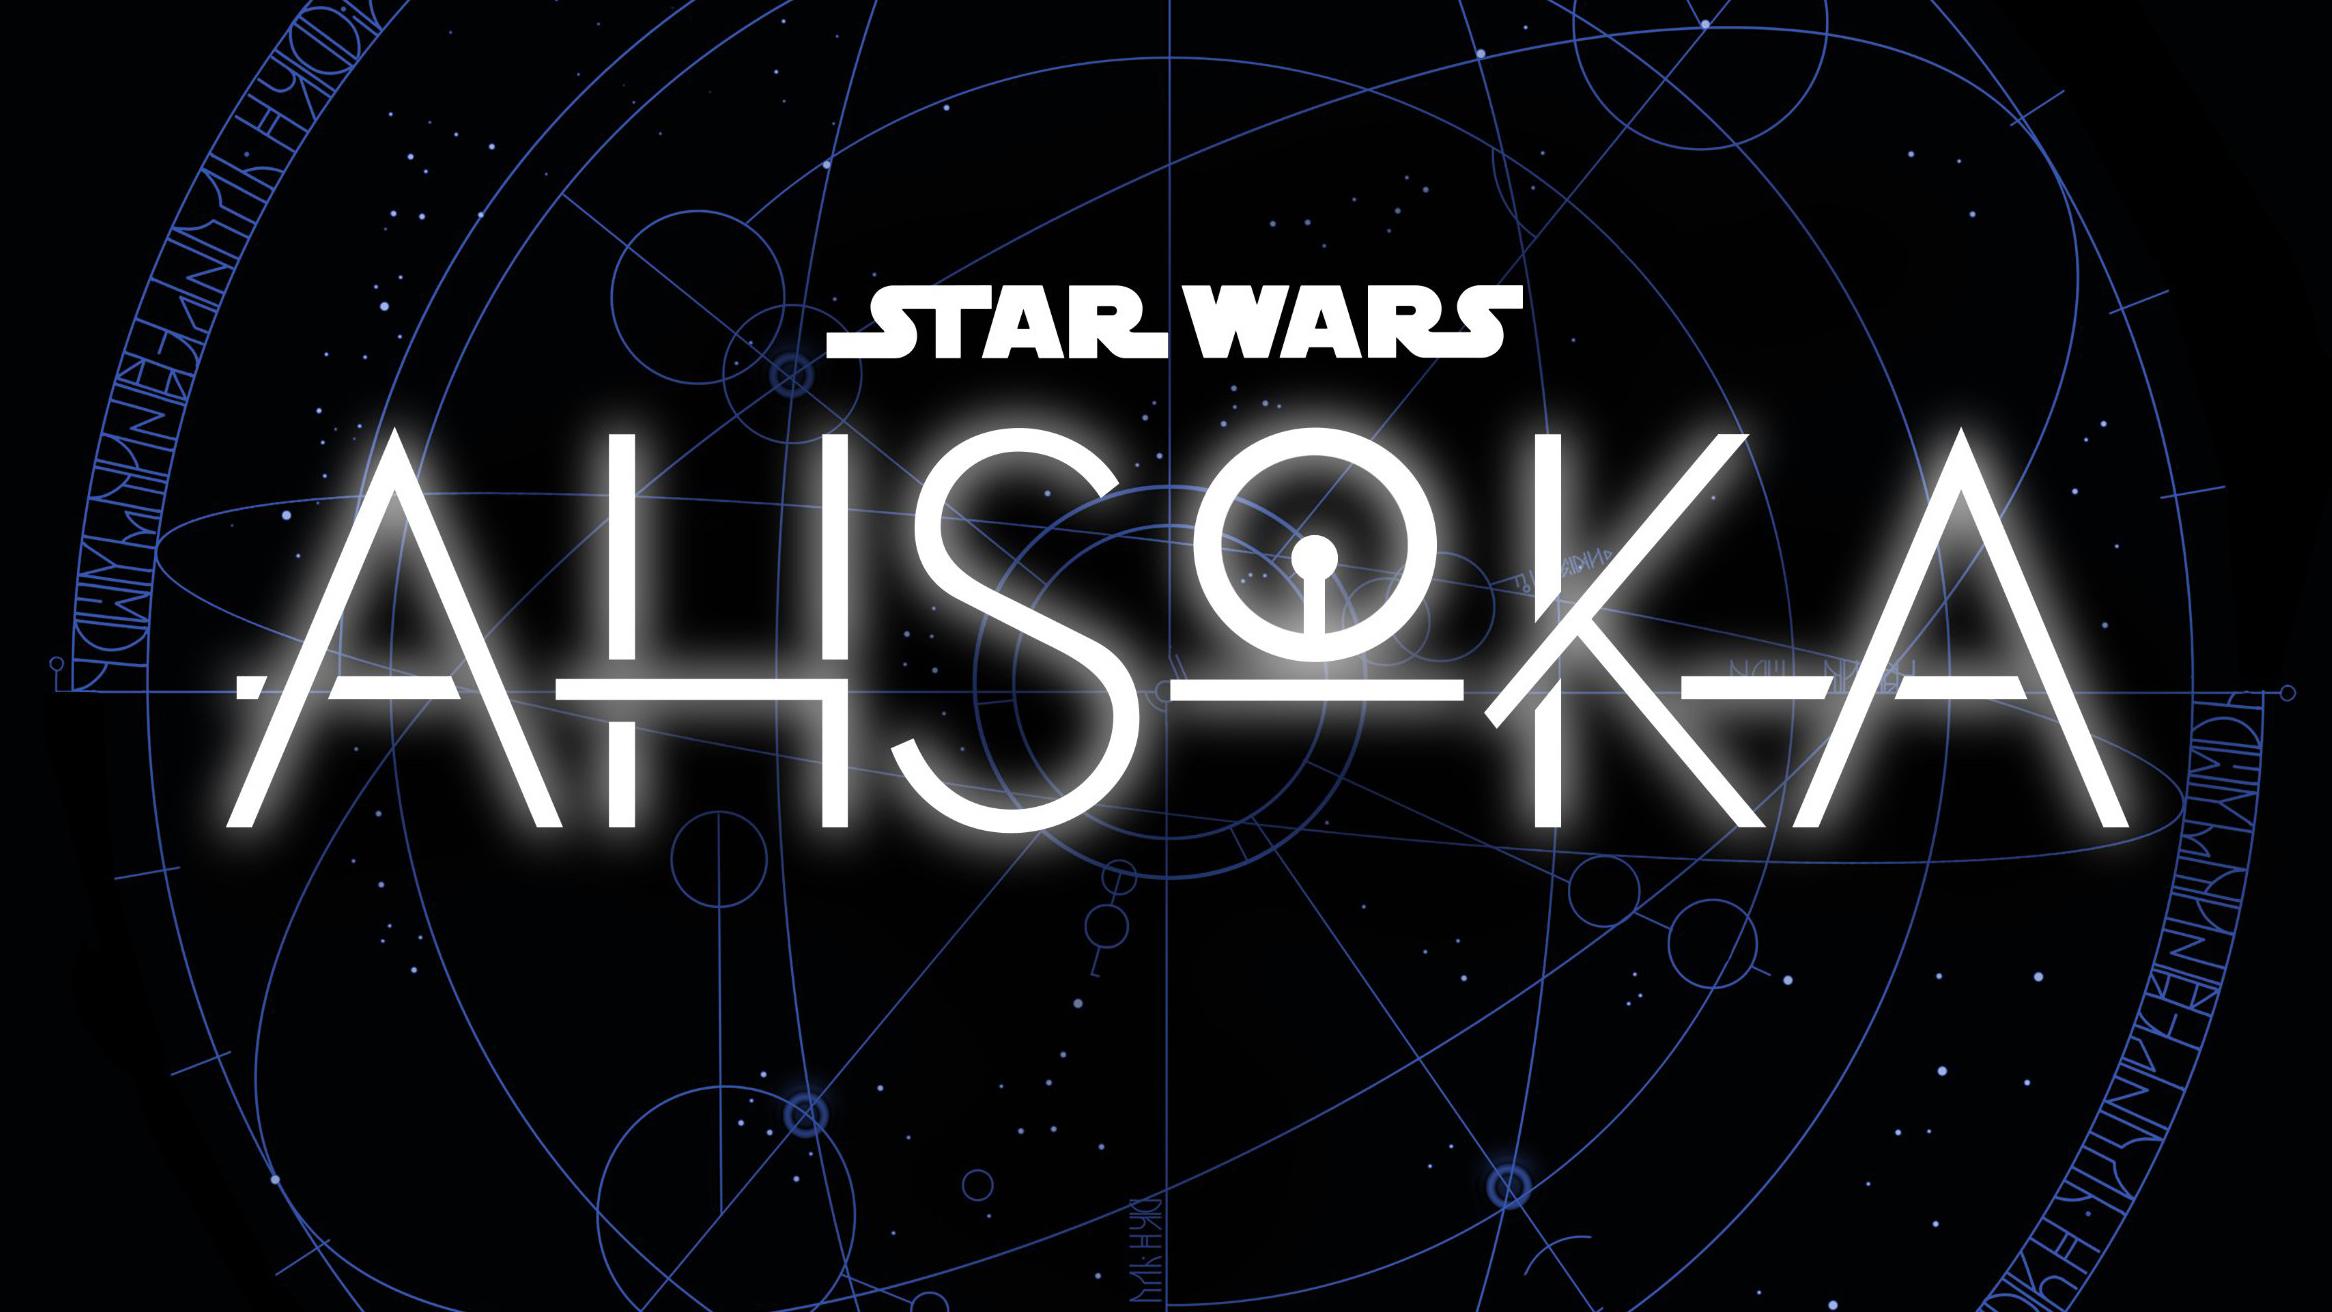 Ahsoka Tano: All About The Jedi's New Star Wars Show